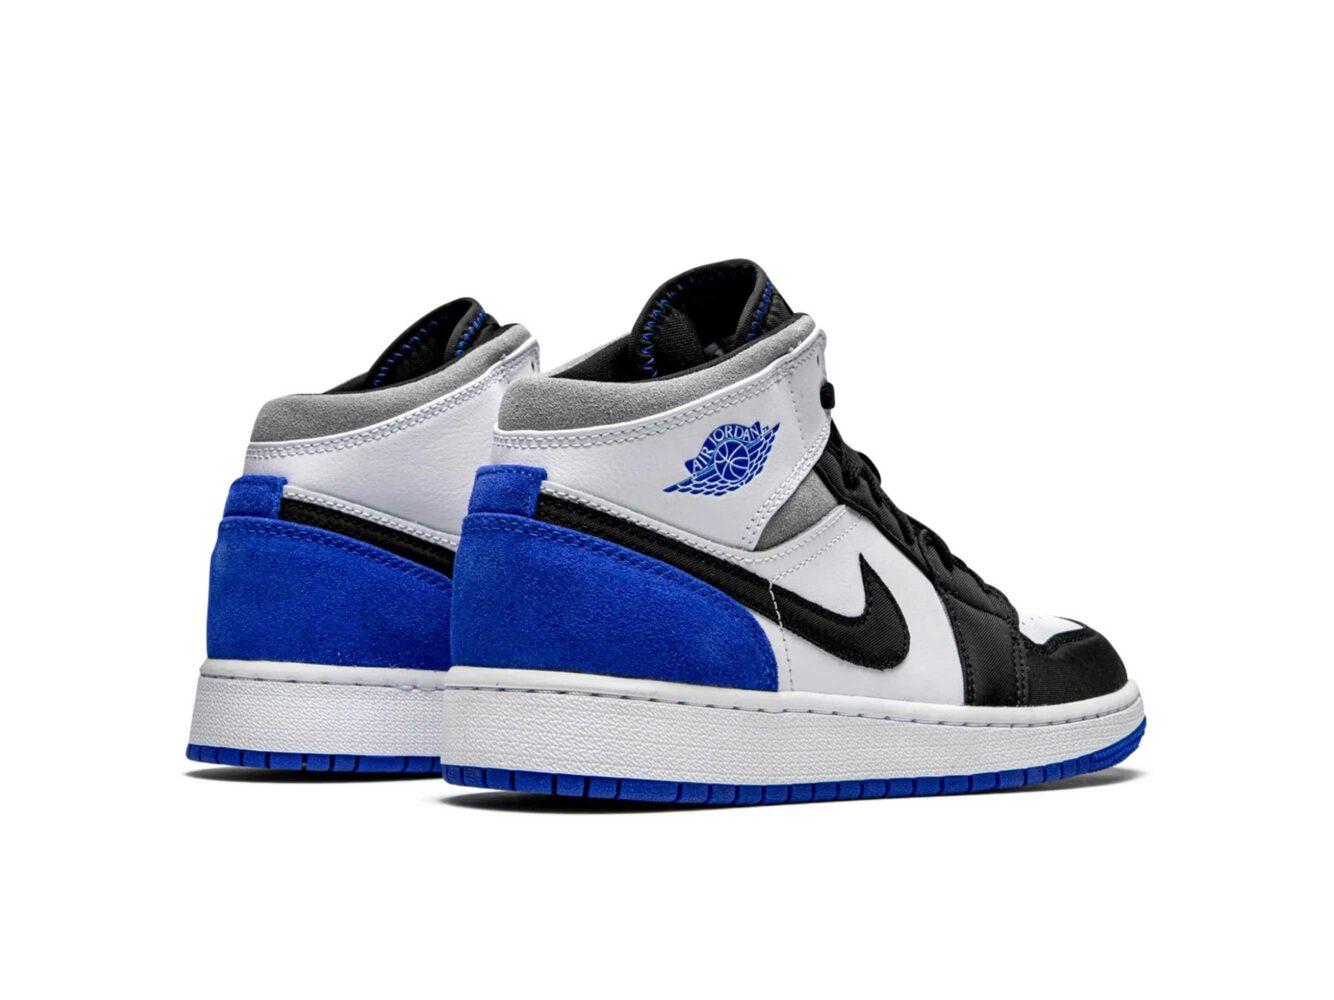 nike air Jordan 1 mid royal white BQ6931_102 купить